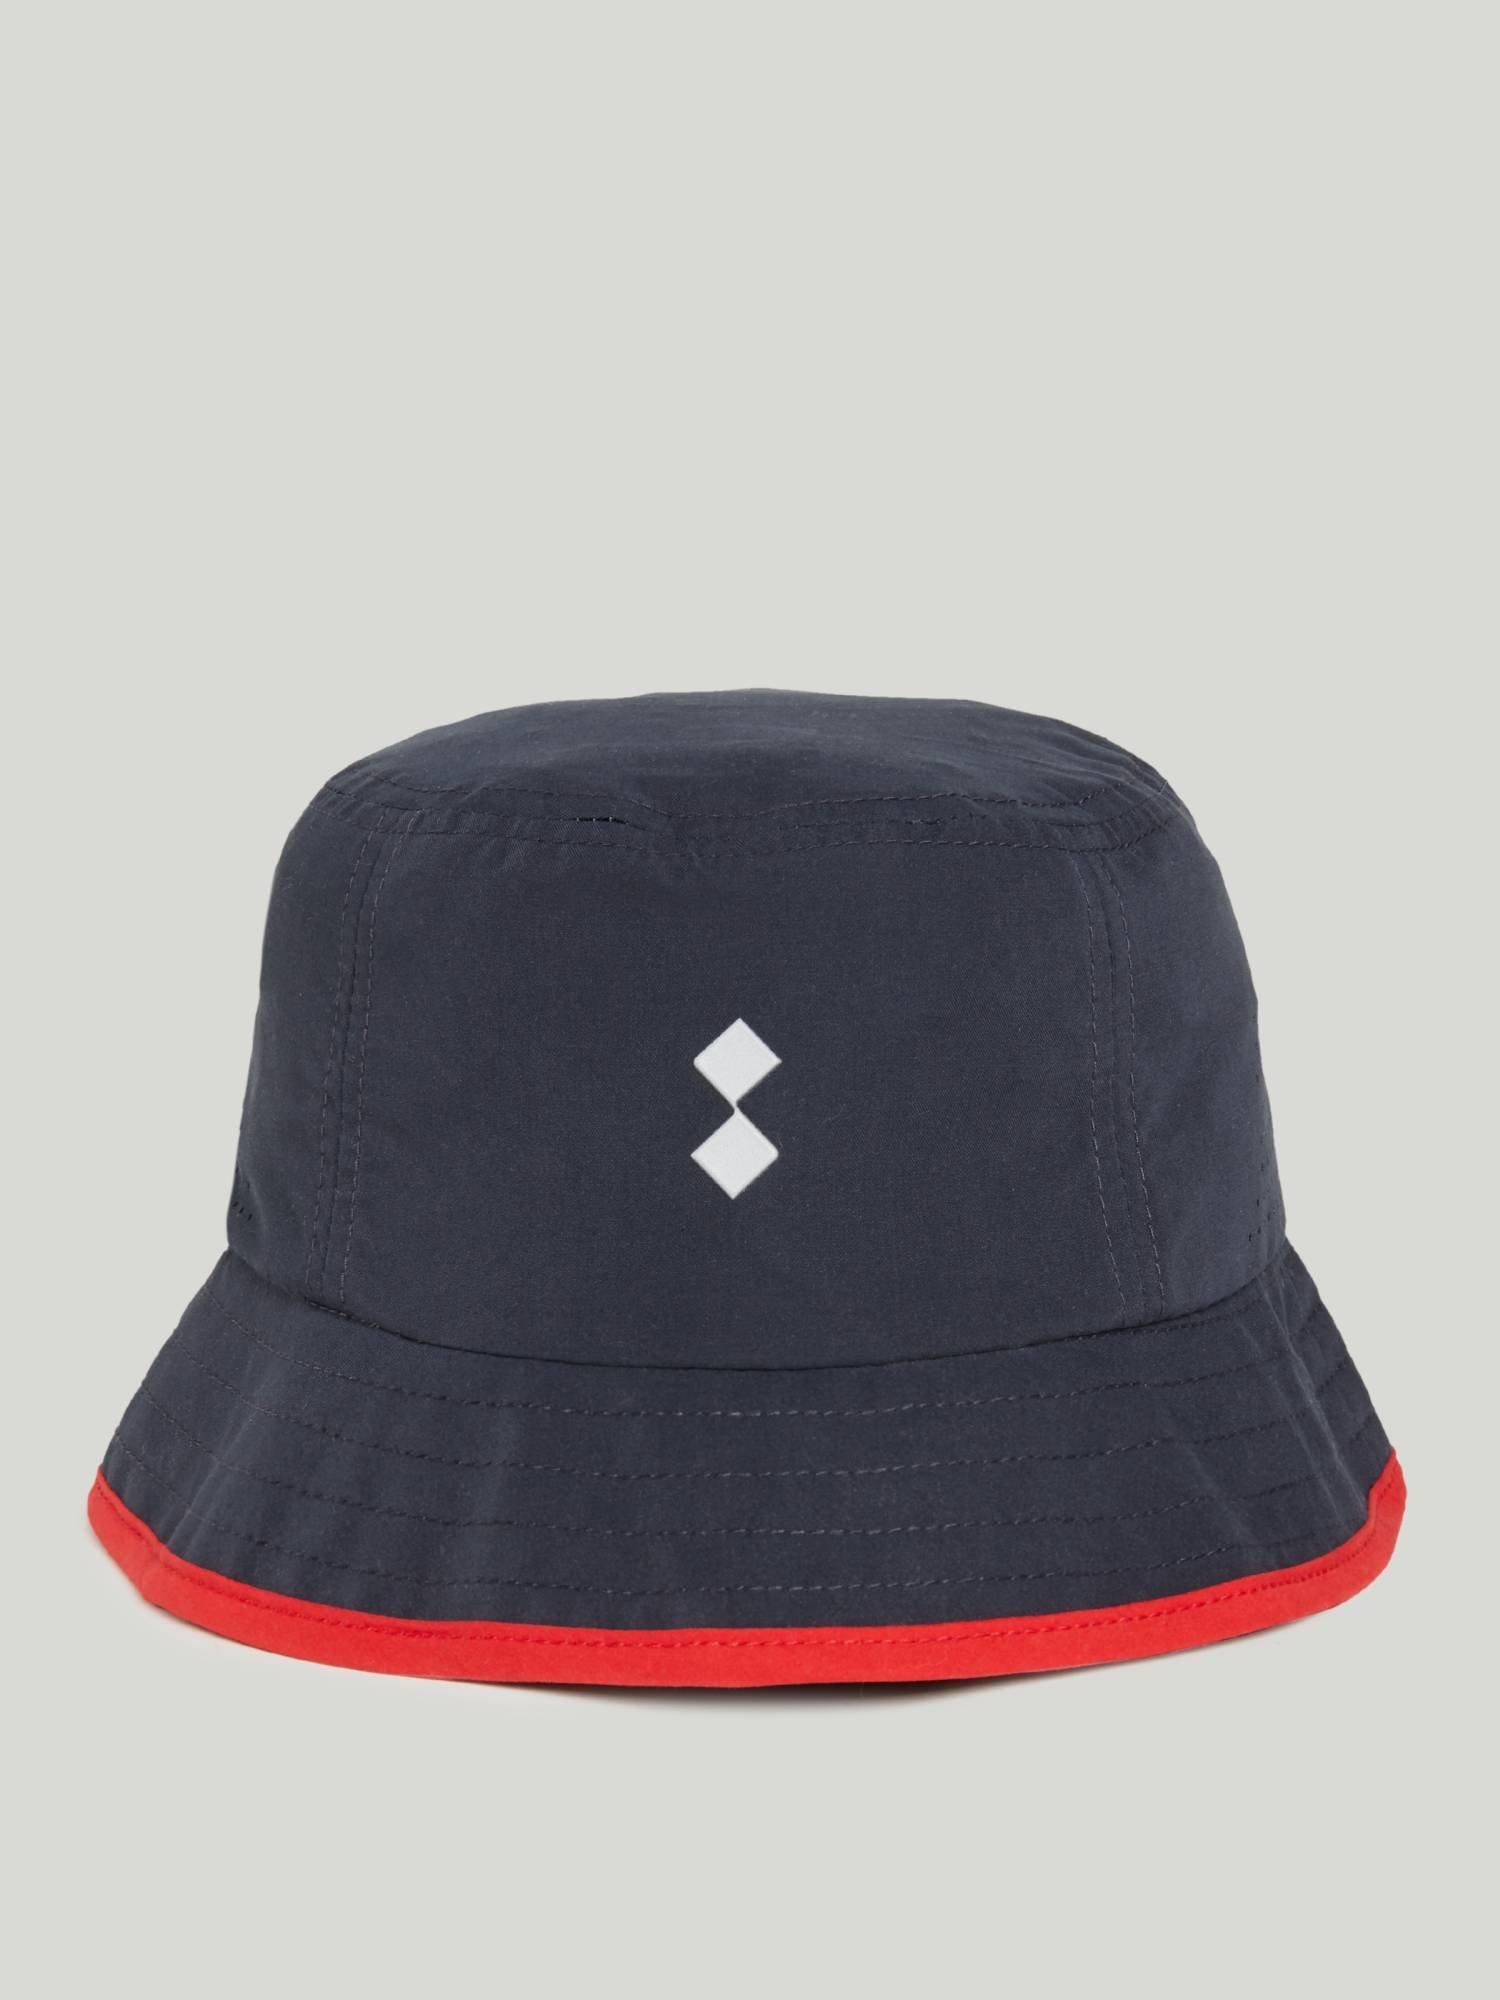 Hat A208 - Navy